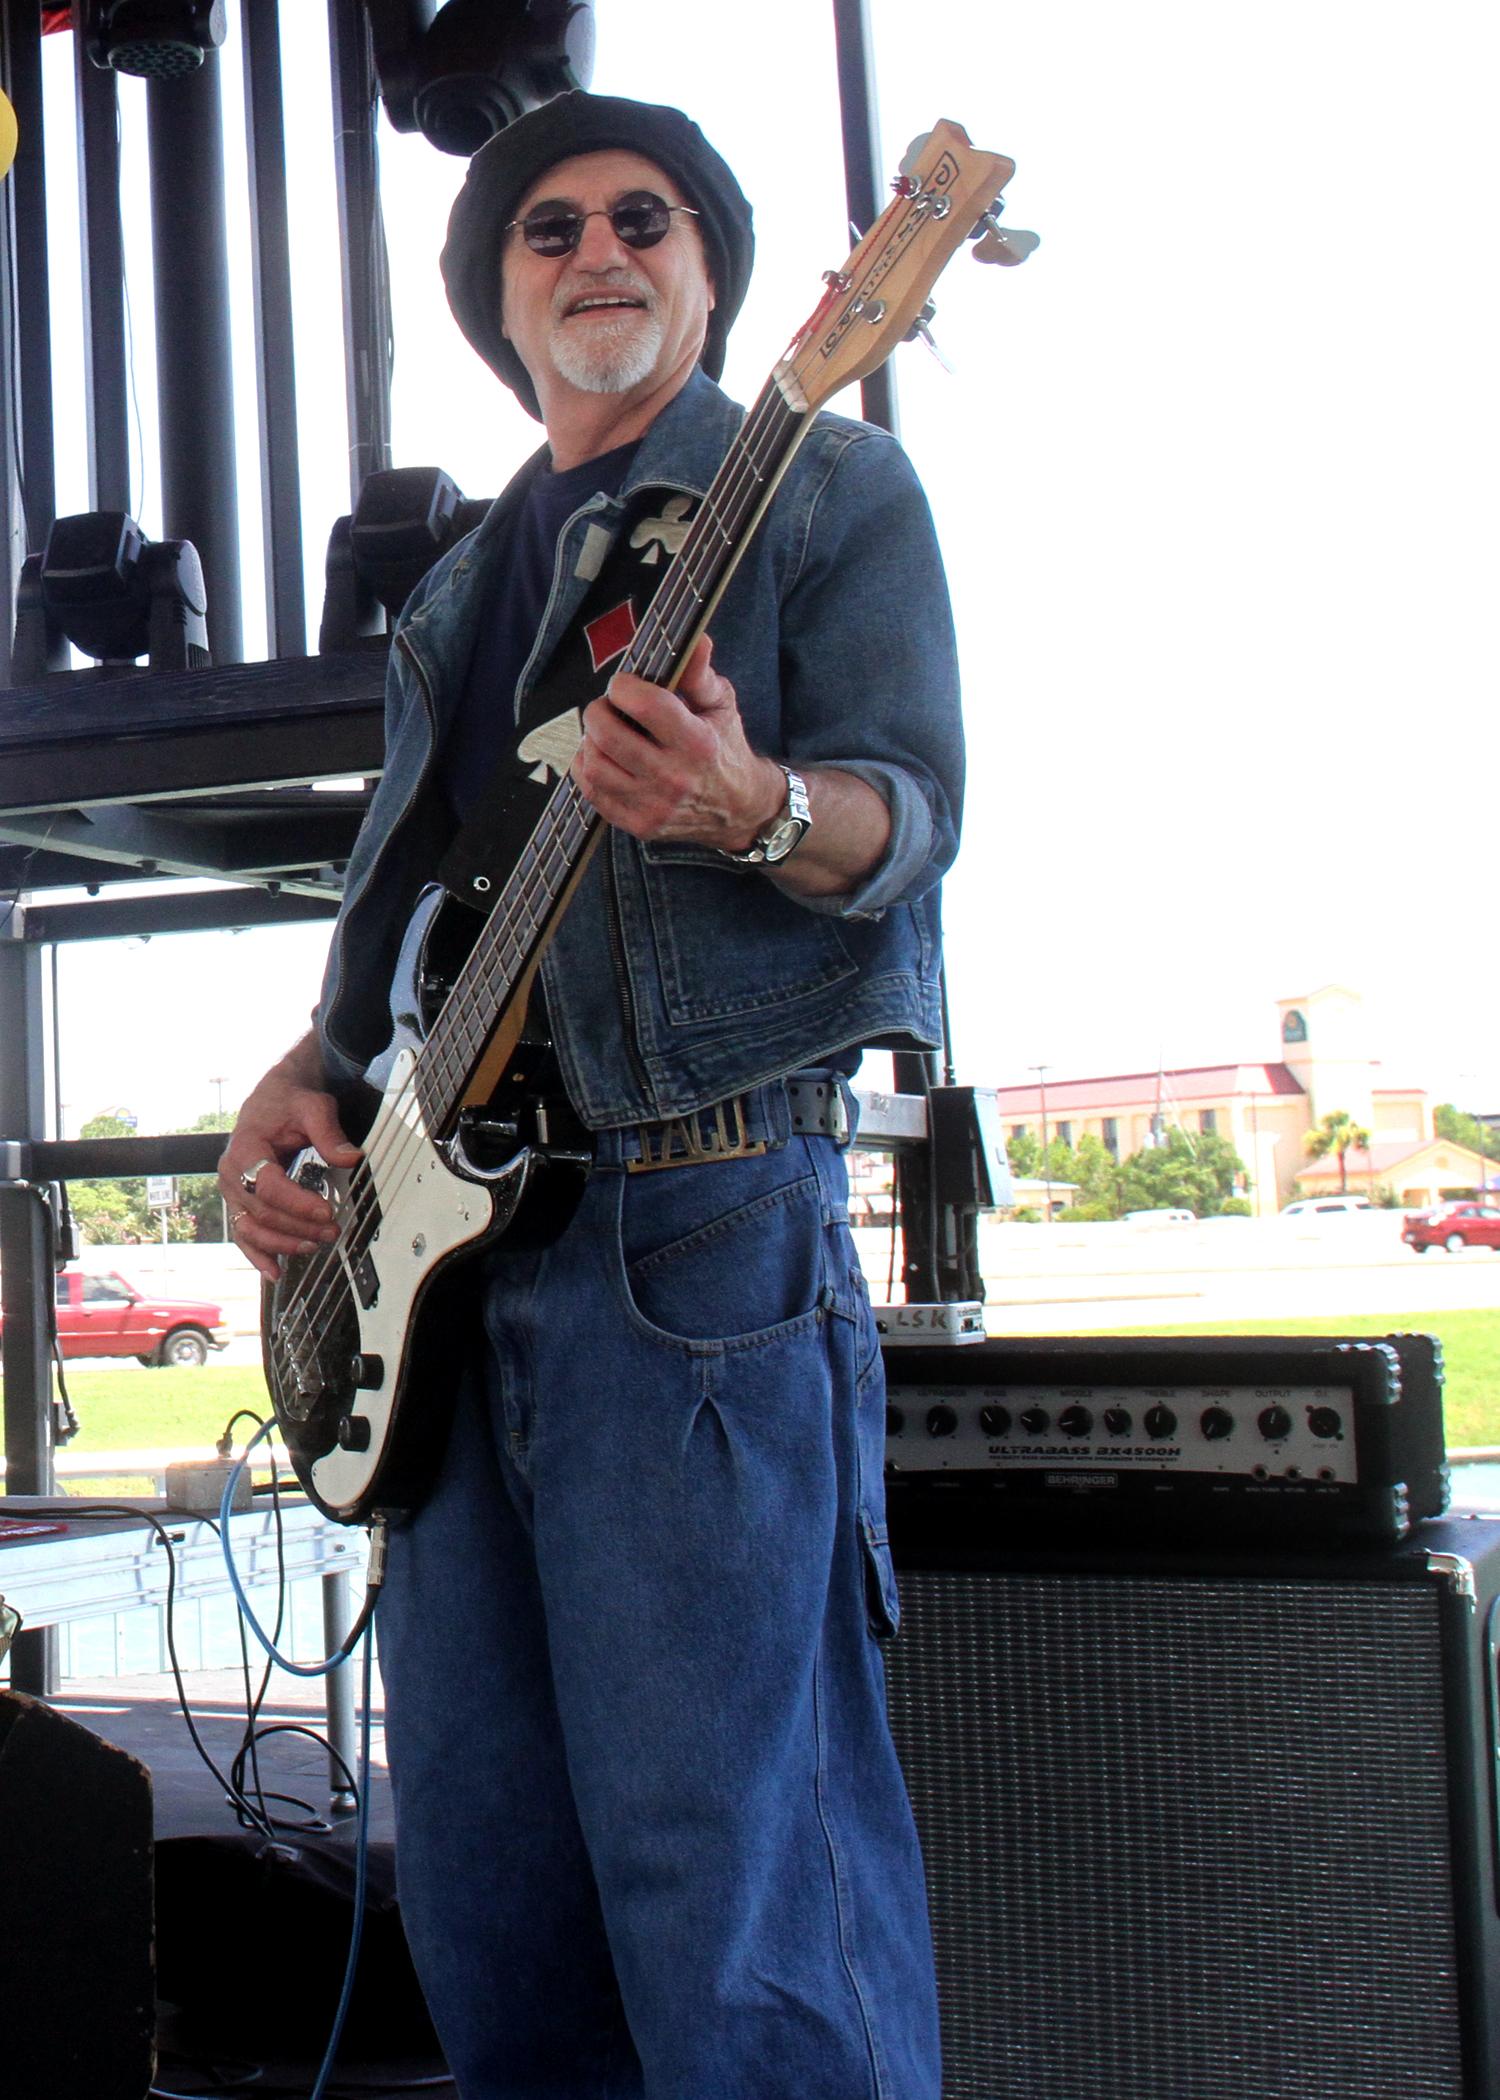 Snits Dog and Pony Show Pub Fountains Stafford, Texas 07032016 (9).jpg